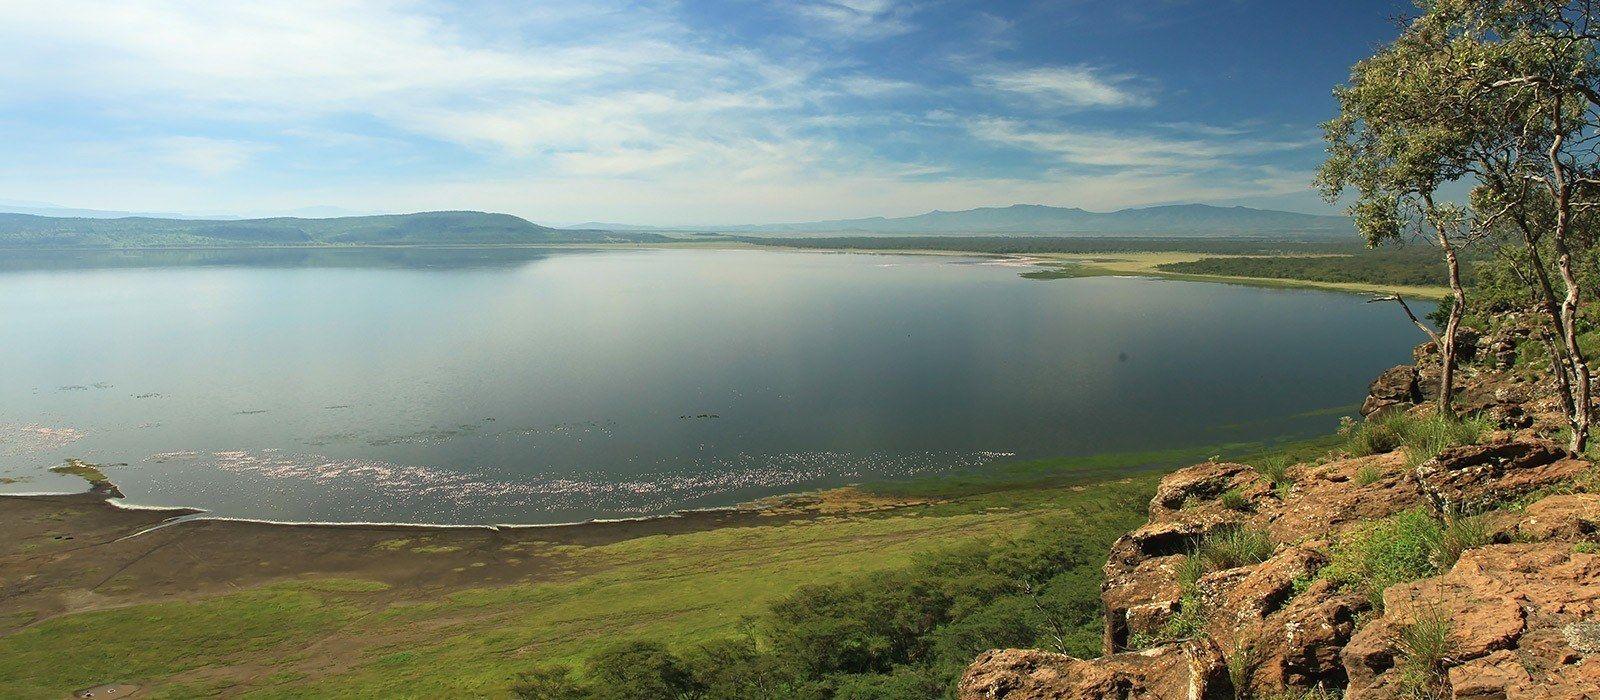 Reiseziel Lake Nakuru & Lake Elementaita Kenia